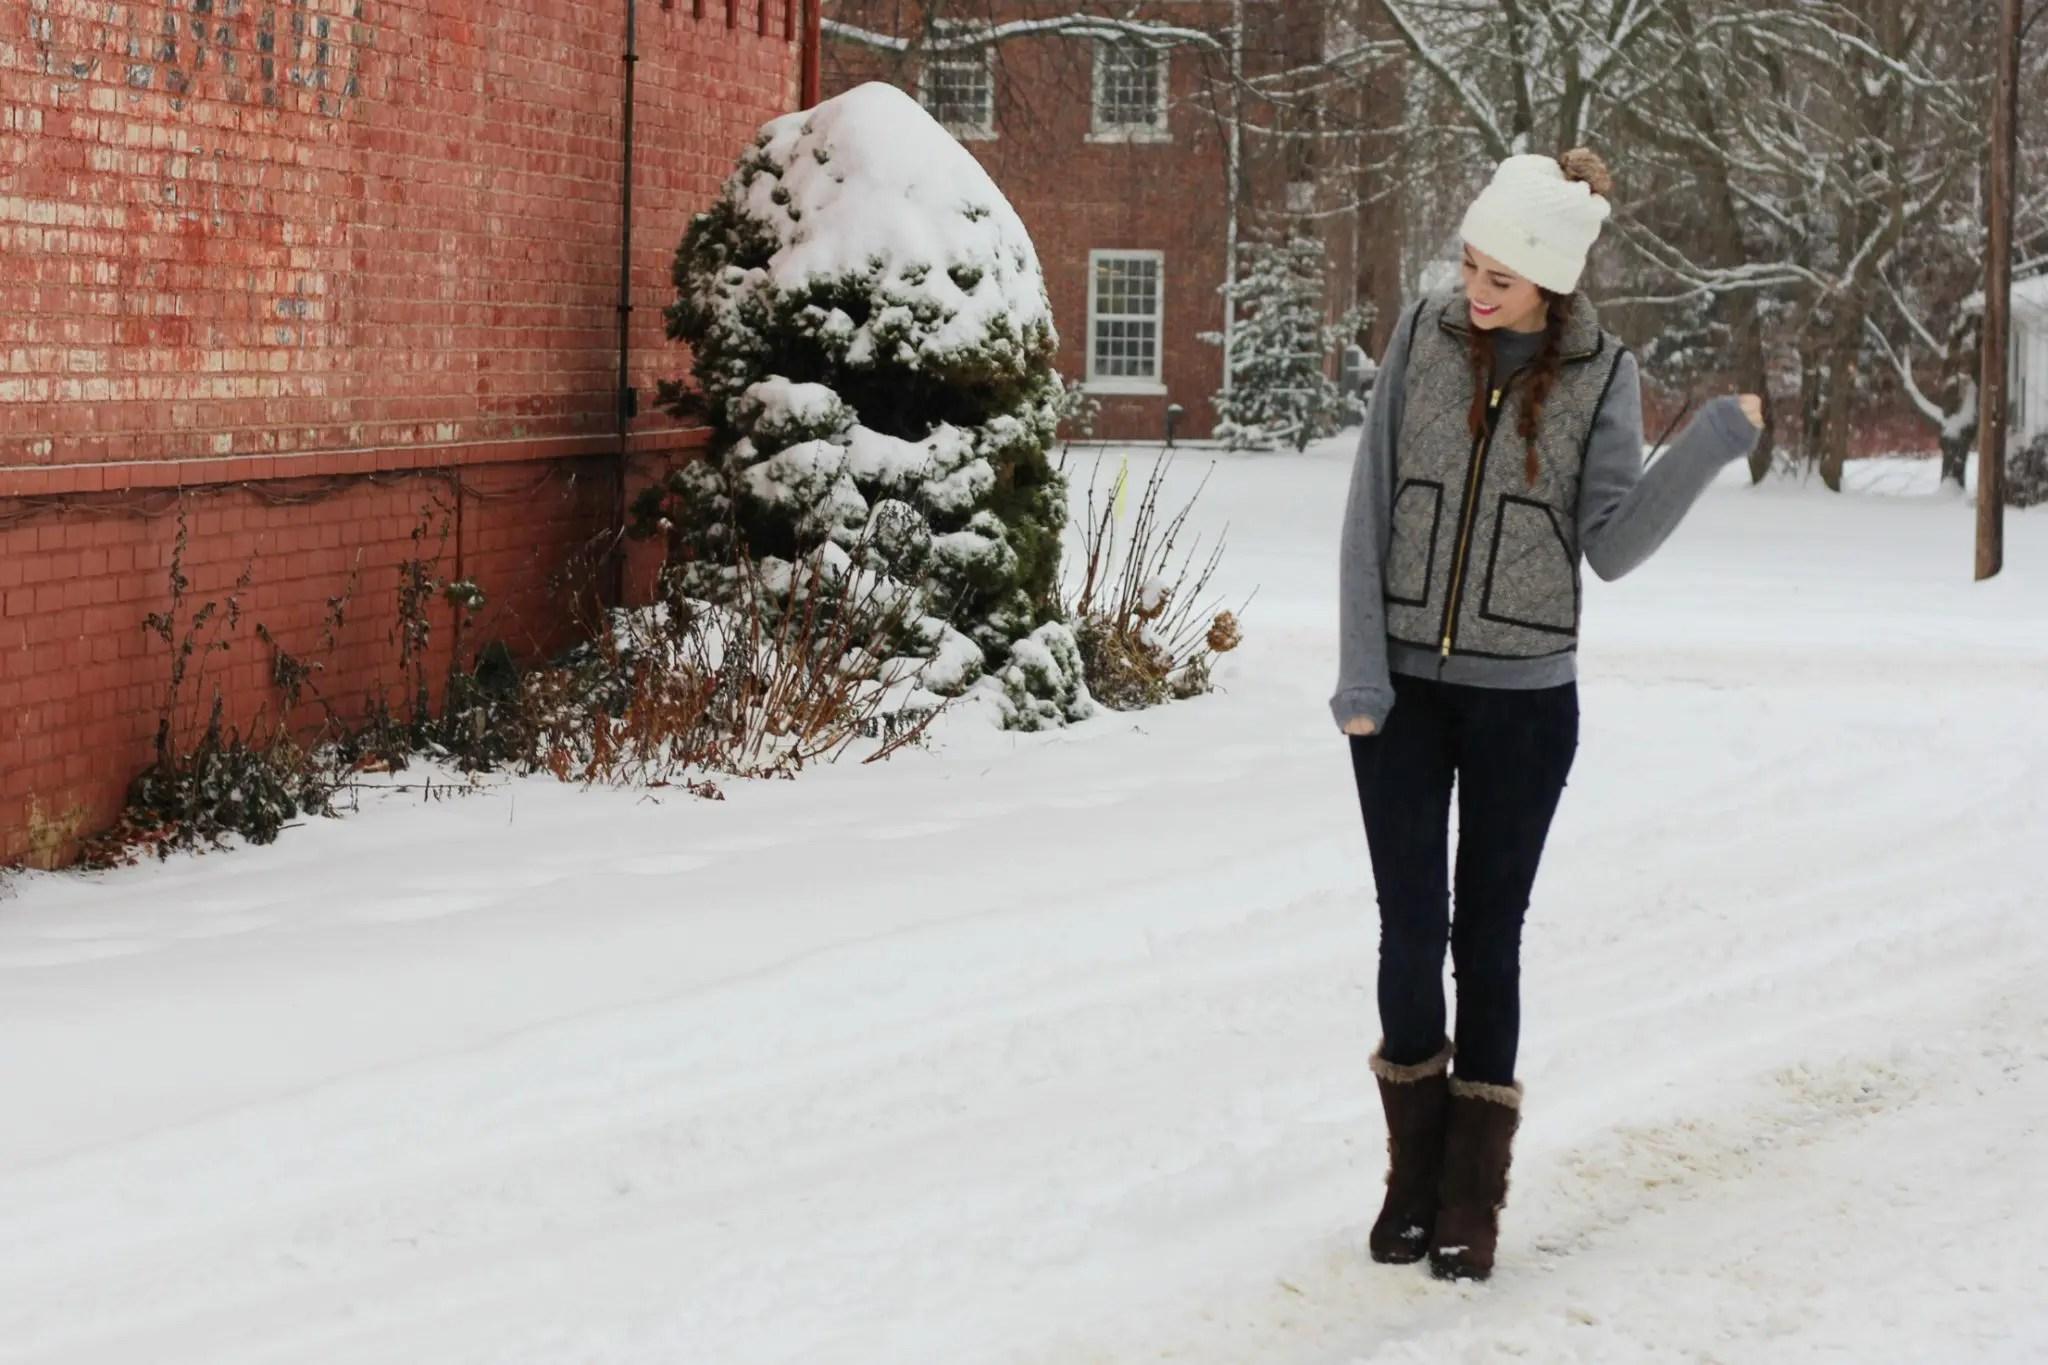 snowy-saturday